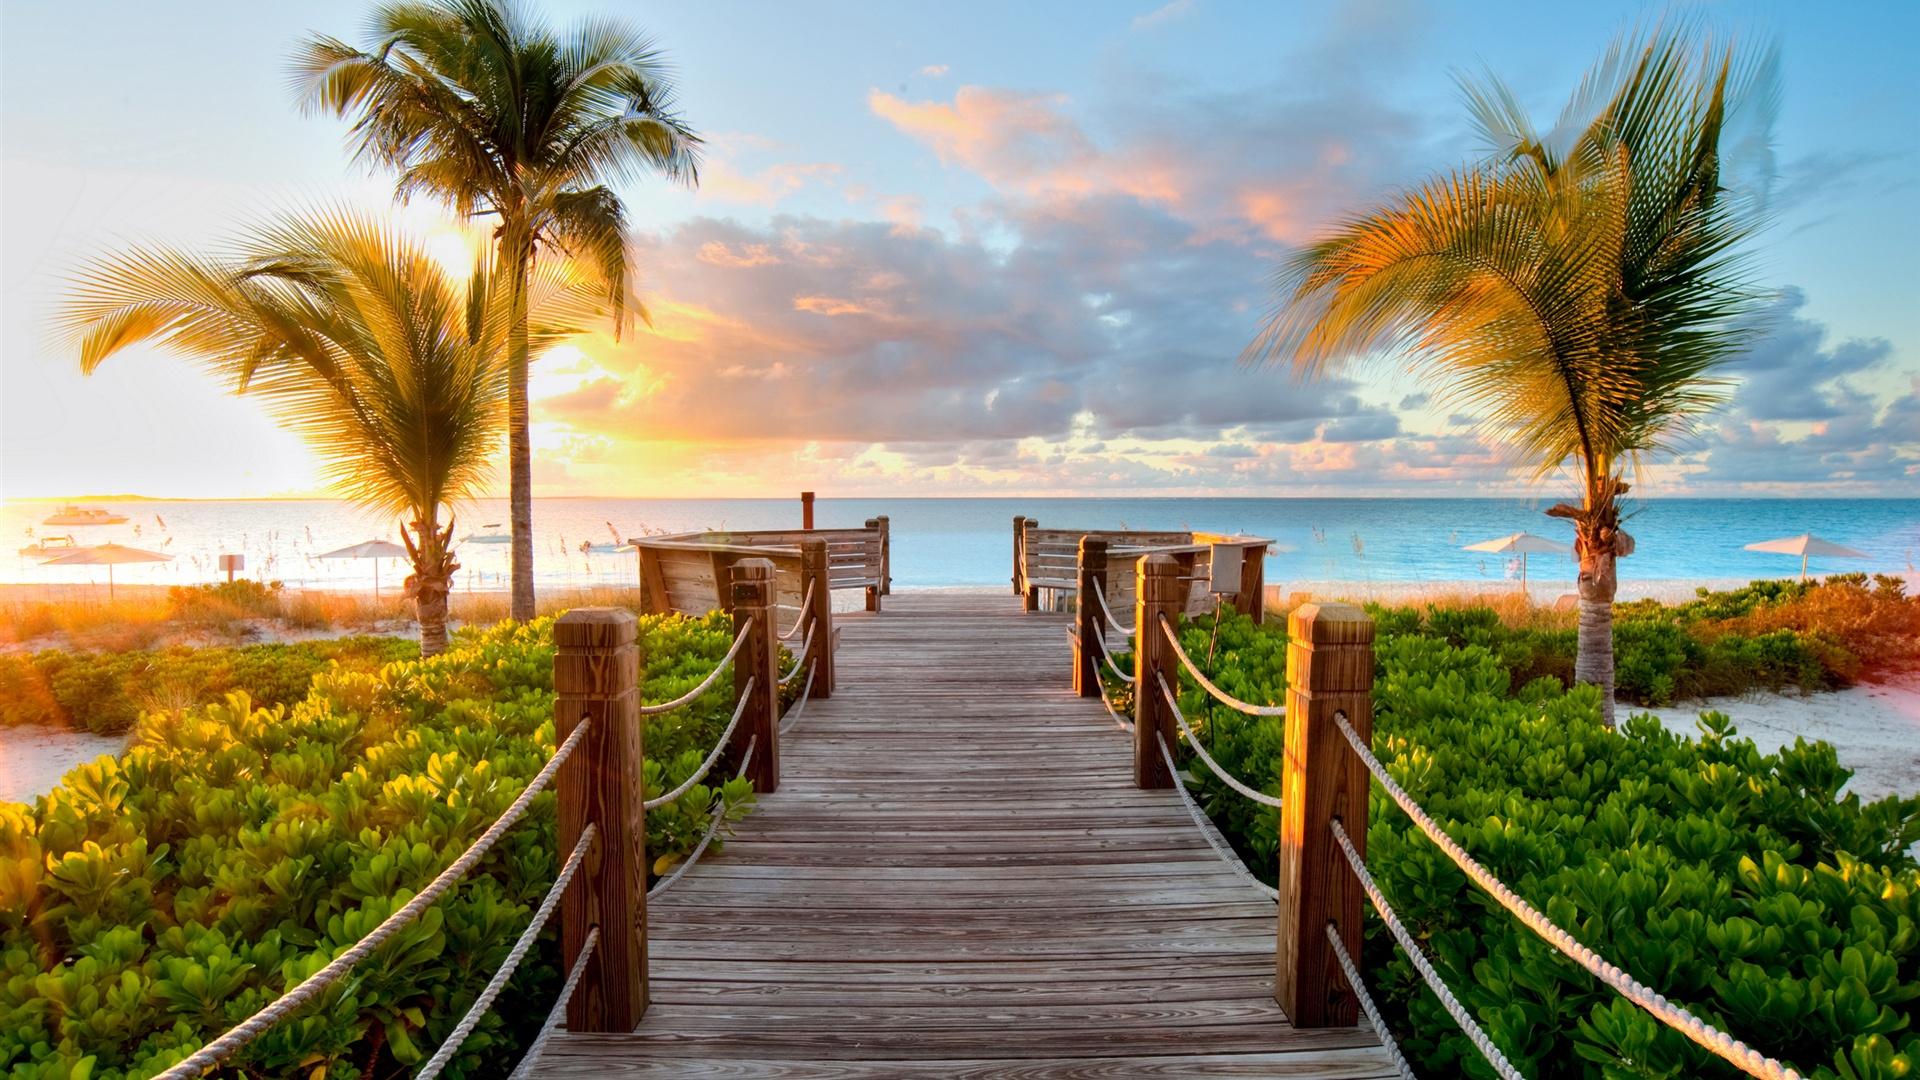 Caribbean Beaches Turks And Caicos Sunset Wallpaper 1920x1080 Full HD